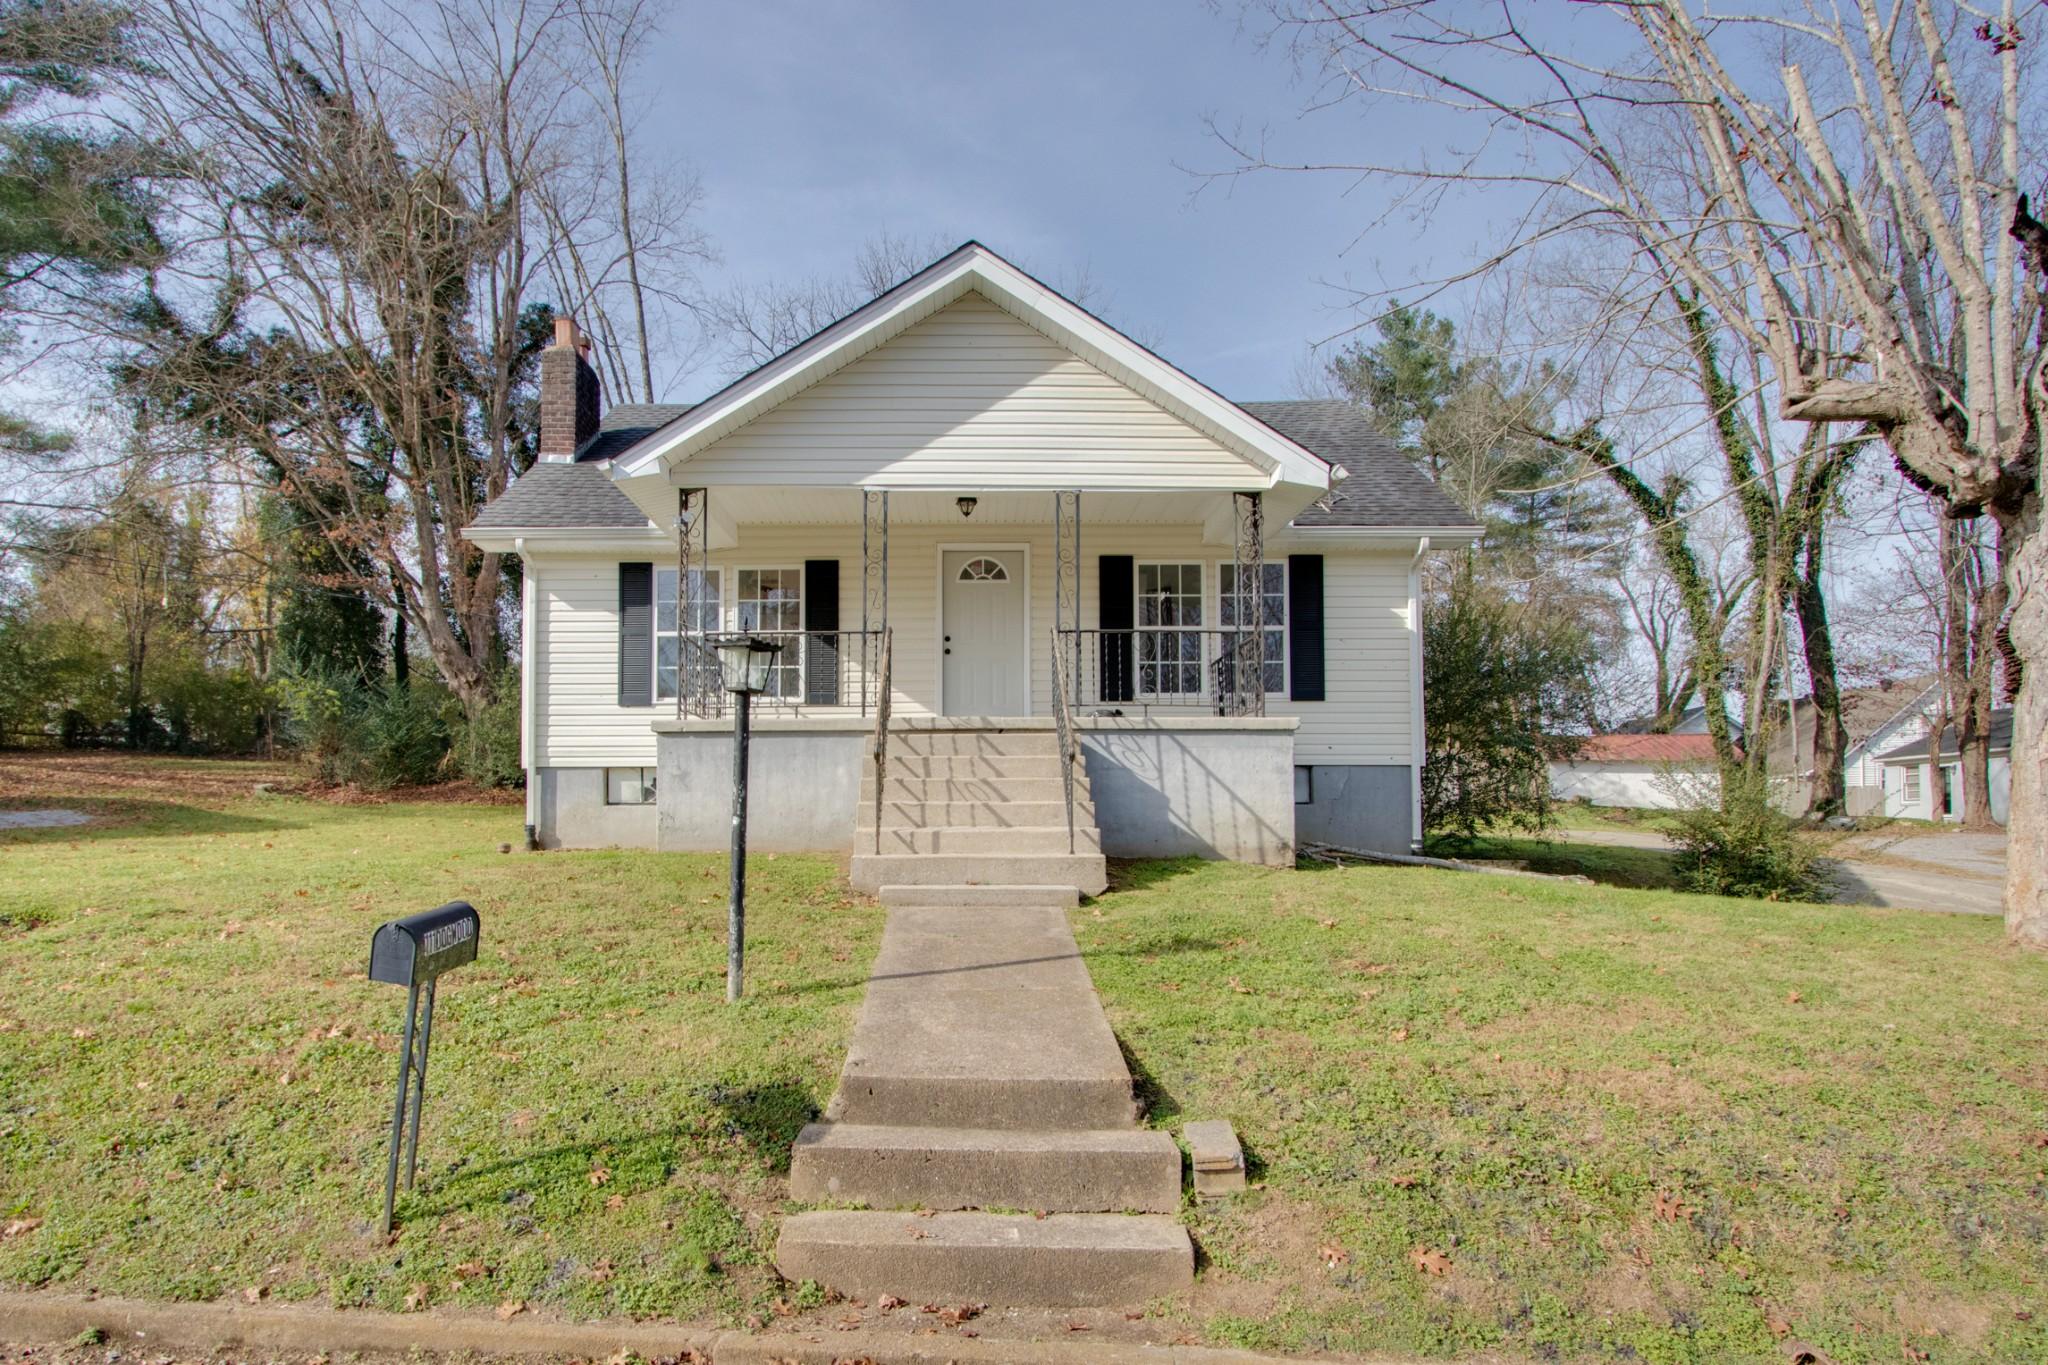 111 Dogwood St Property Photo - Carthage, TN real estate listing